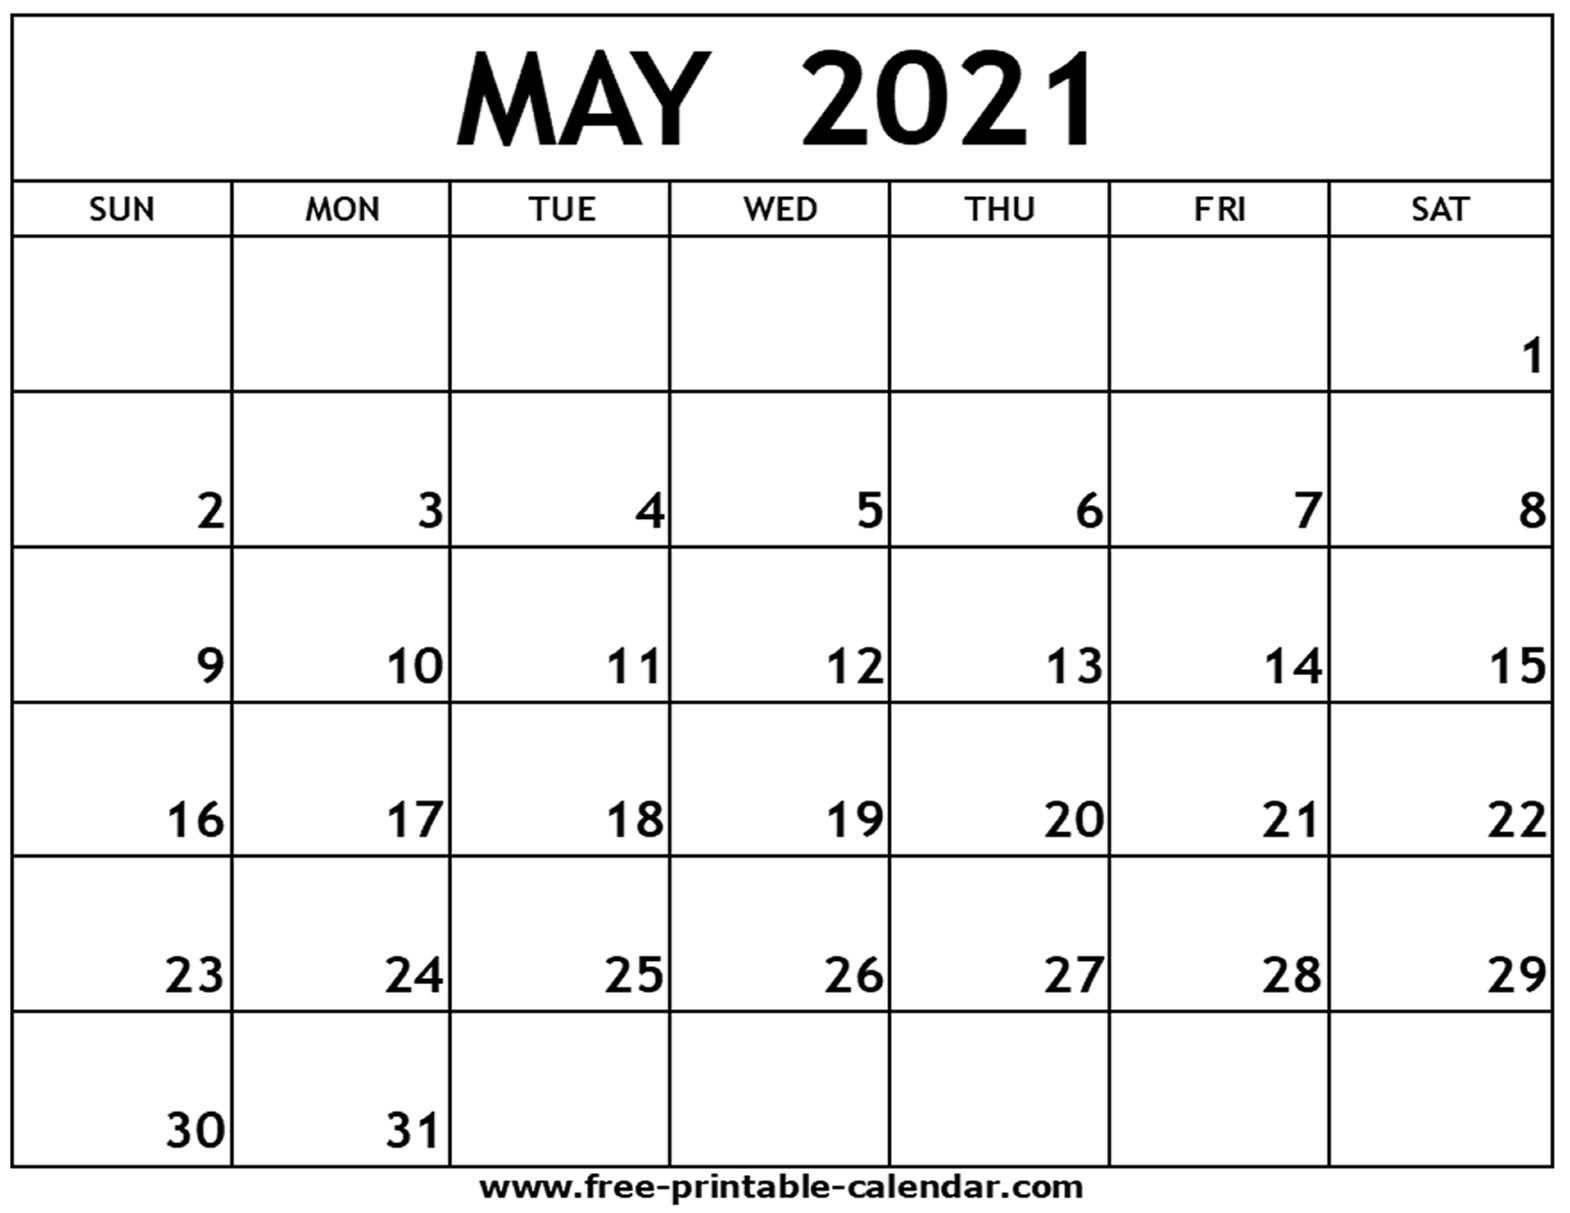 May 2021 Printable Calendar - Free-Printable-Calendar